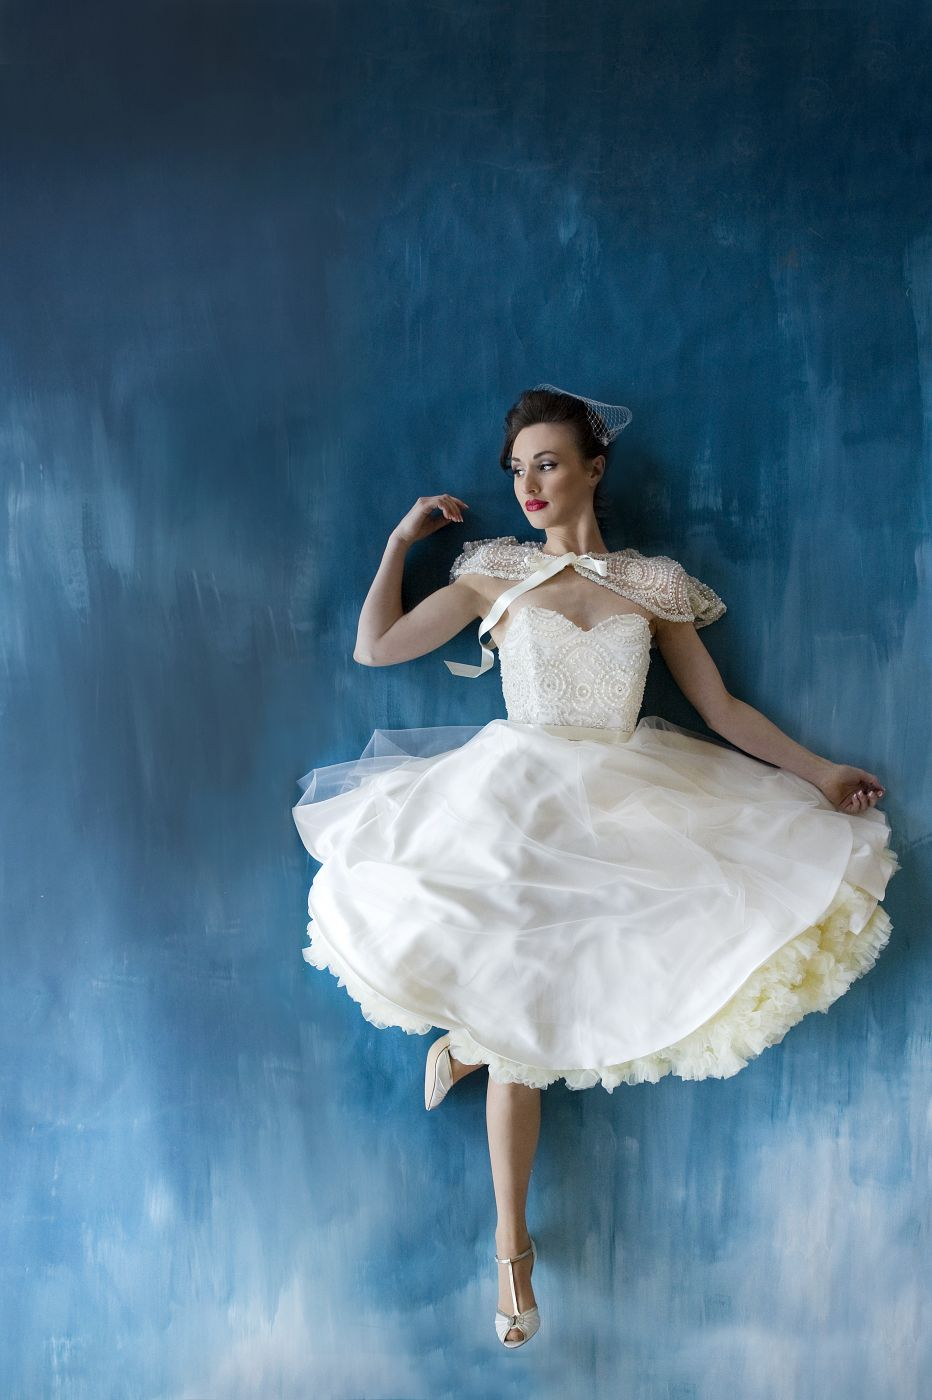 Helen Rhiannon Designer Label - Bespoke Bridal Gowns